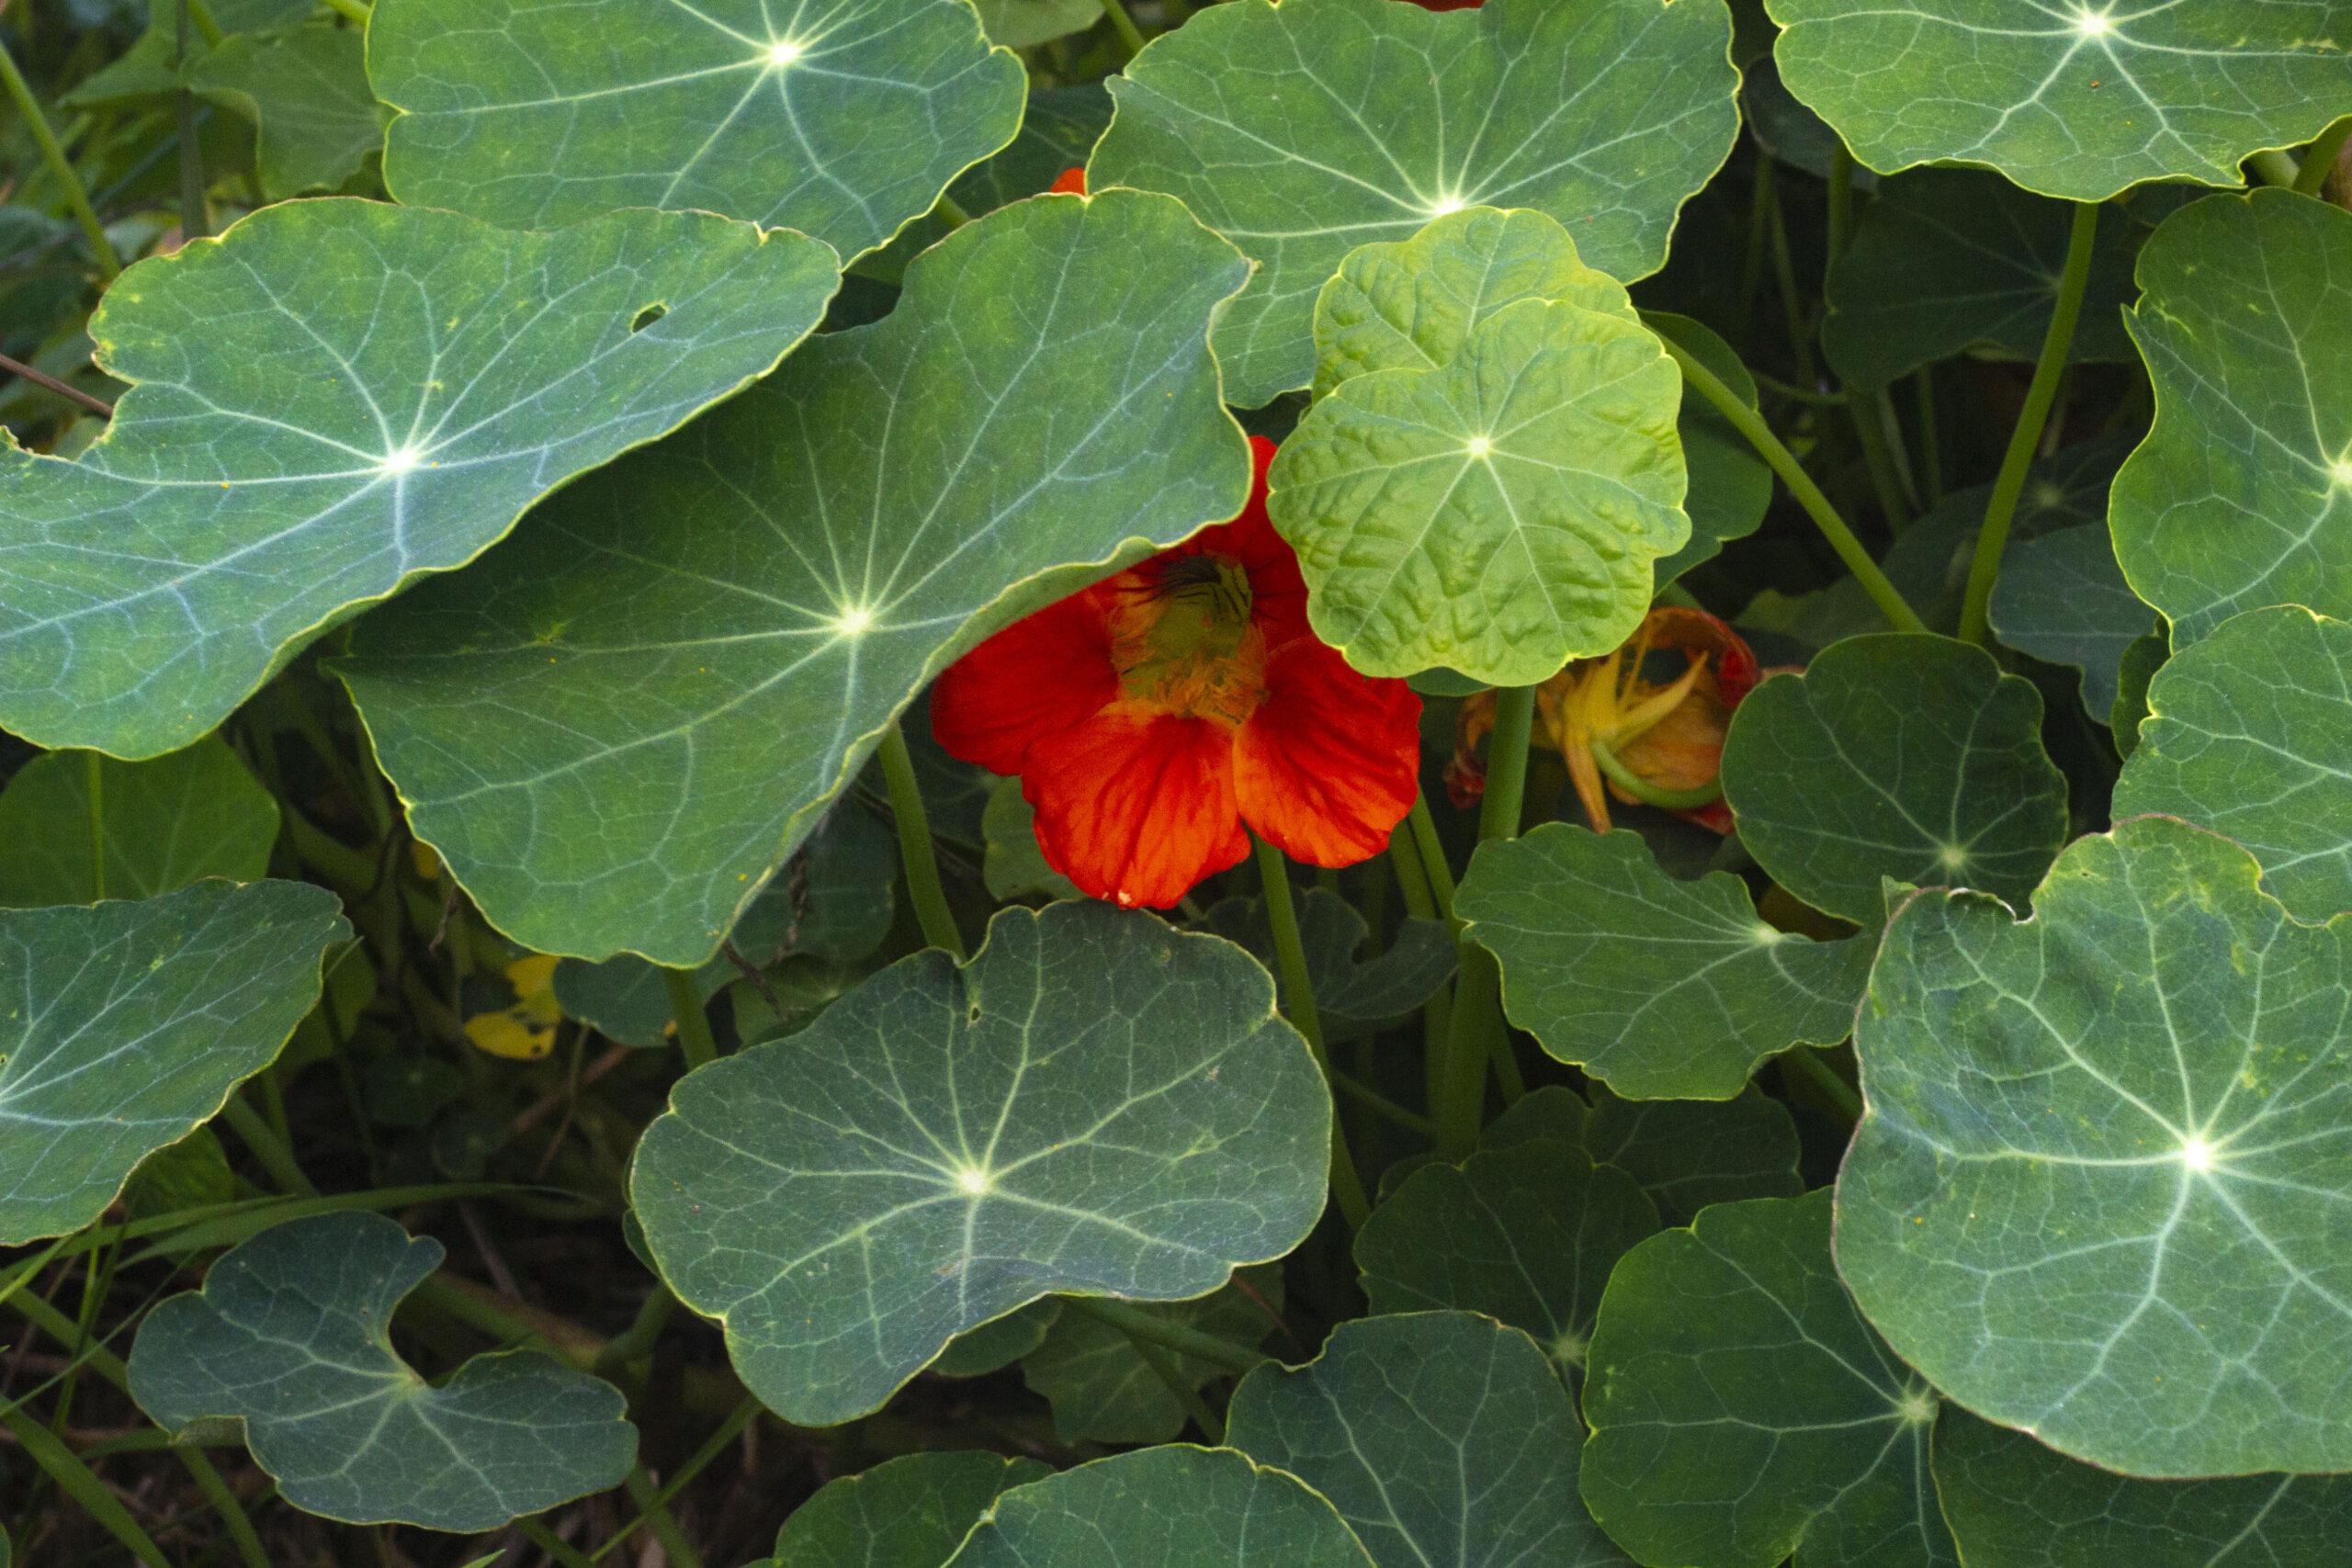 Farvestrålende blomster